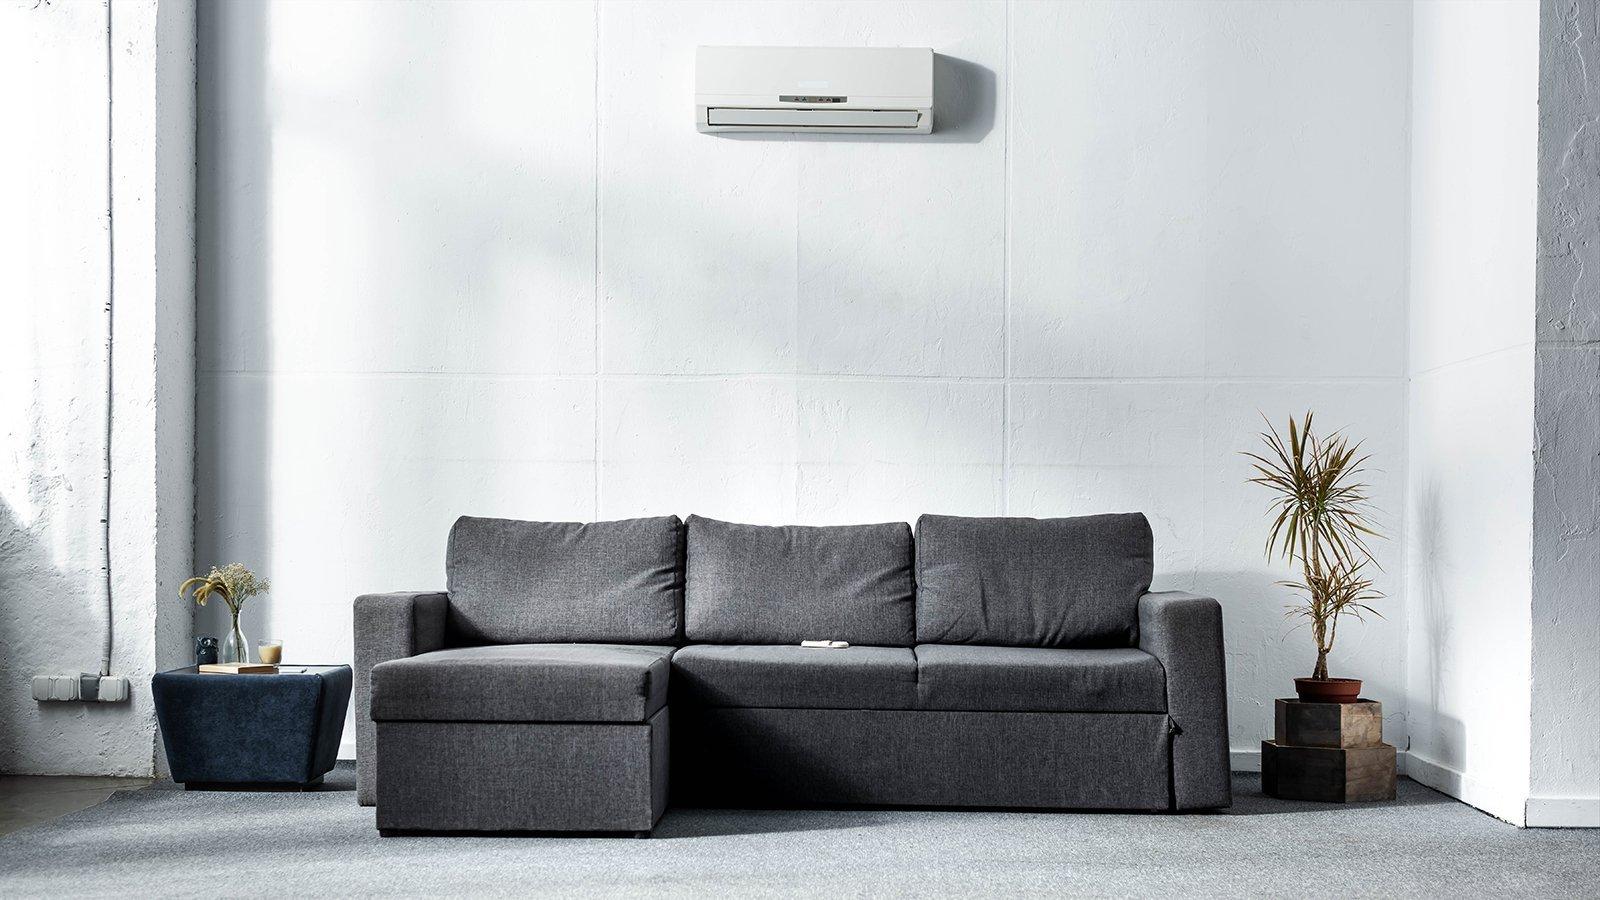 grey sofa near green plants in modern living room